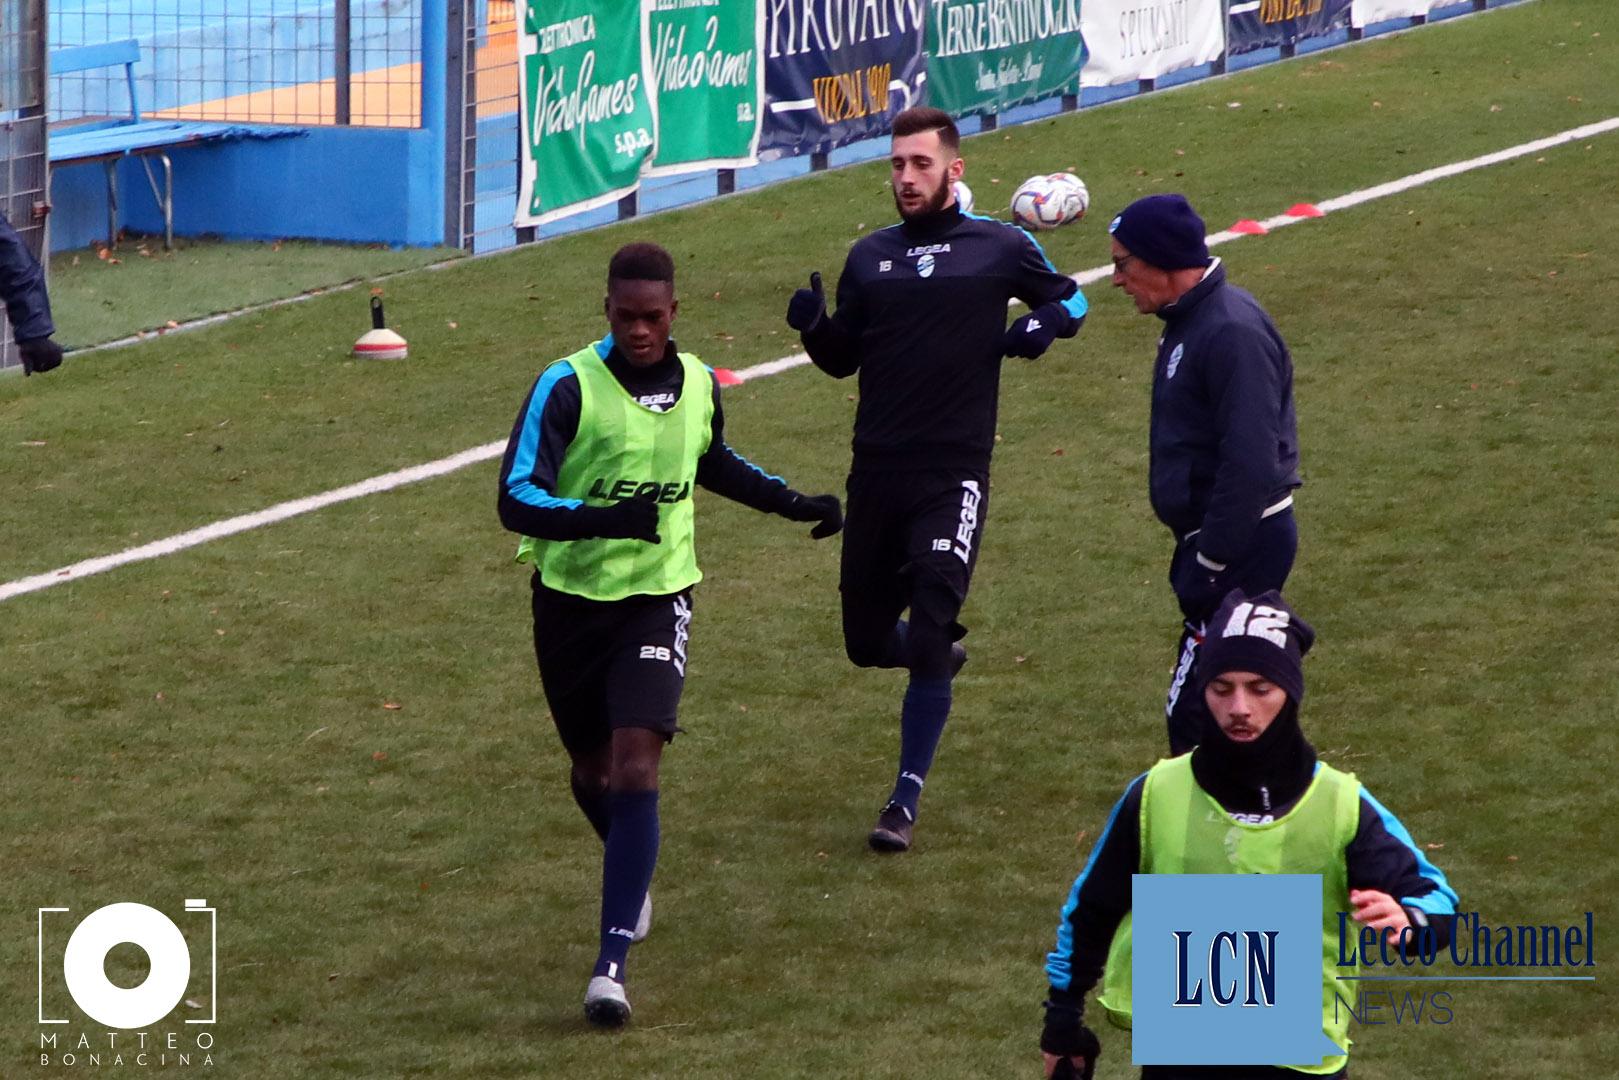 Calcio Lecco Allenamento 28 Dicembre 2018 Samake (5)